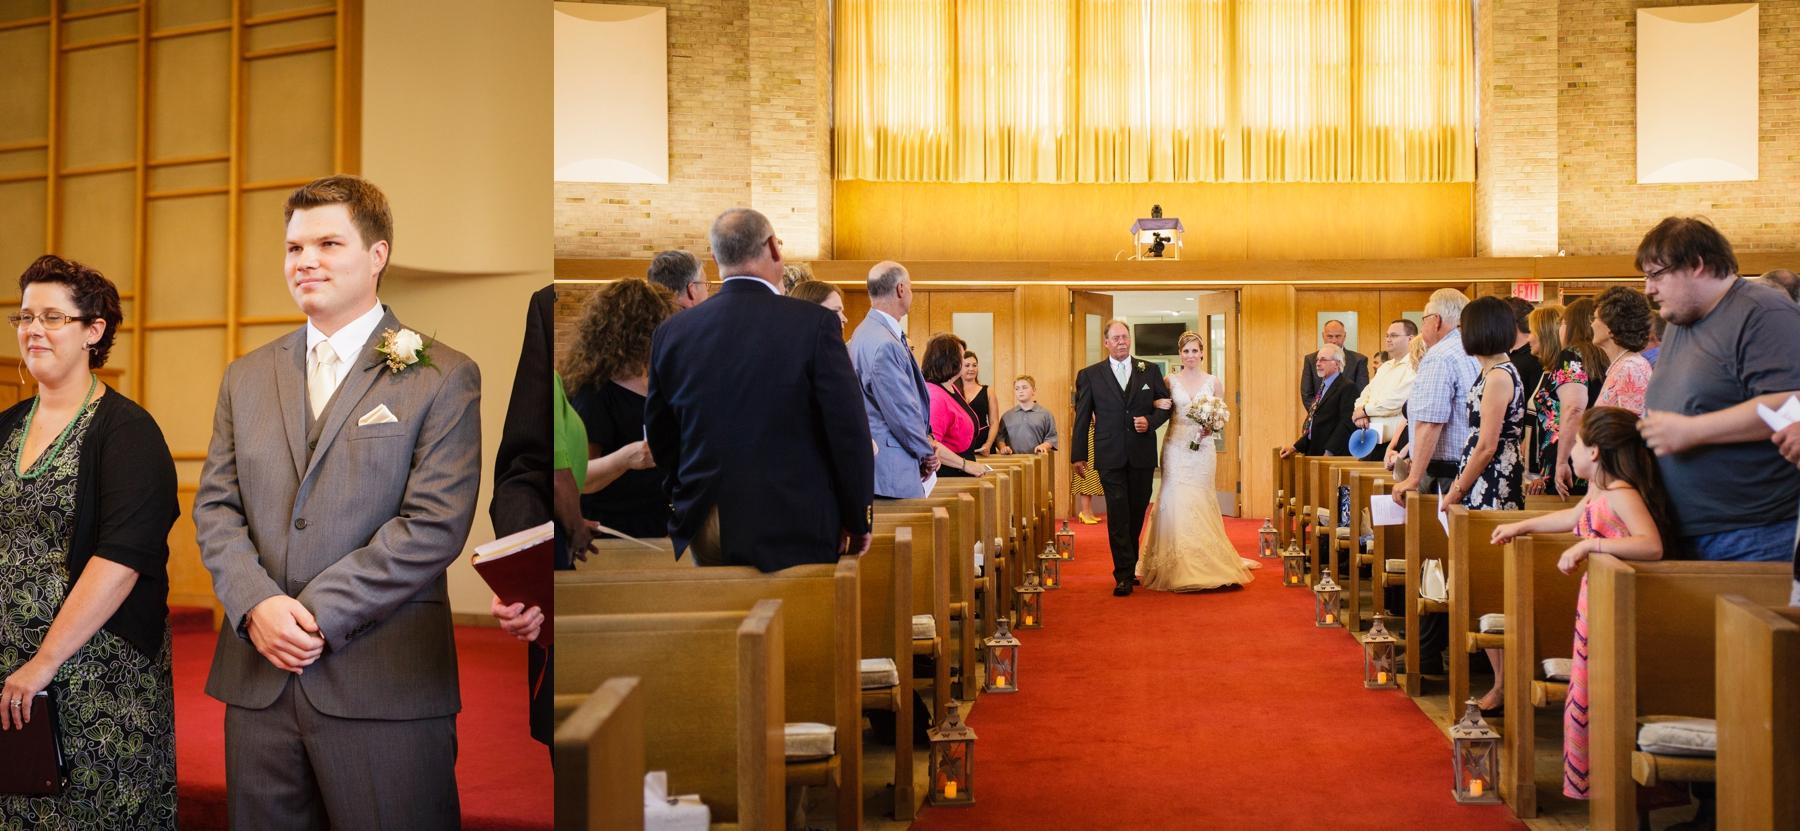 Ben_Jillian_Midland_Baycity_Wedding_0036.jpg